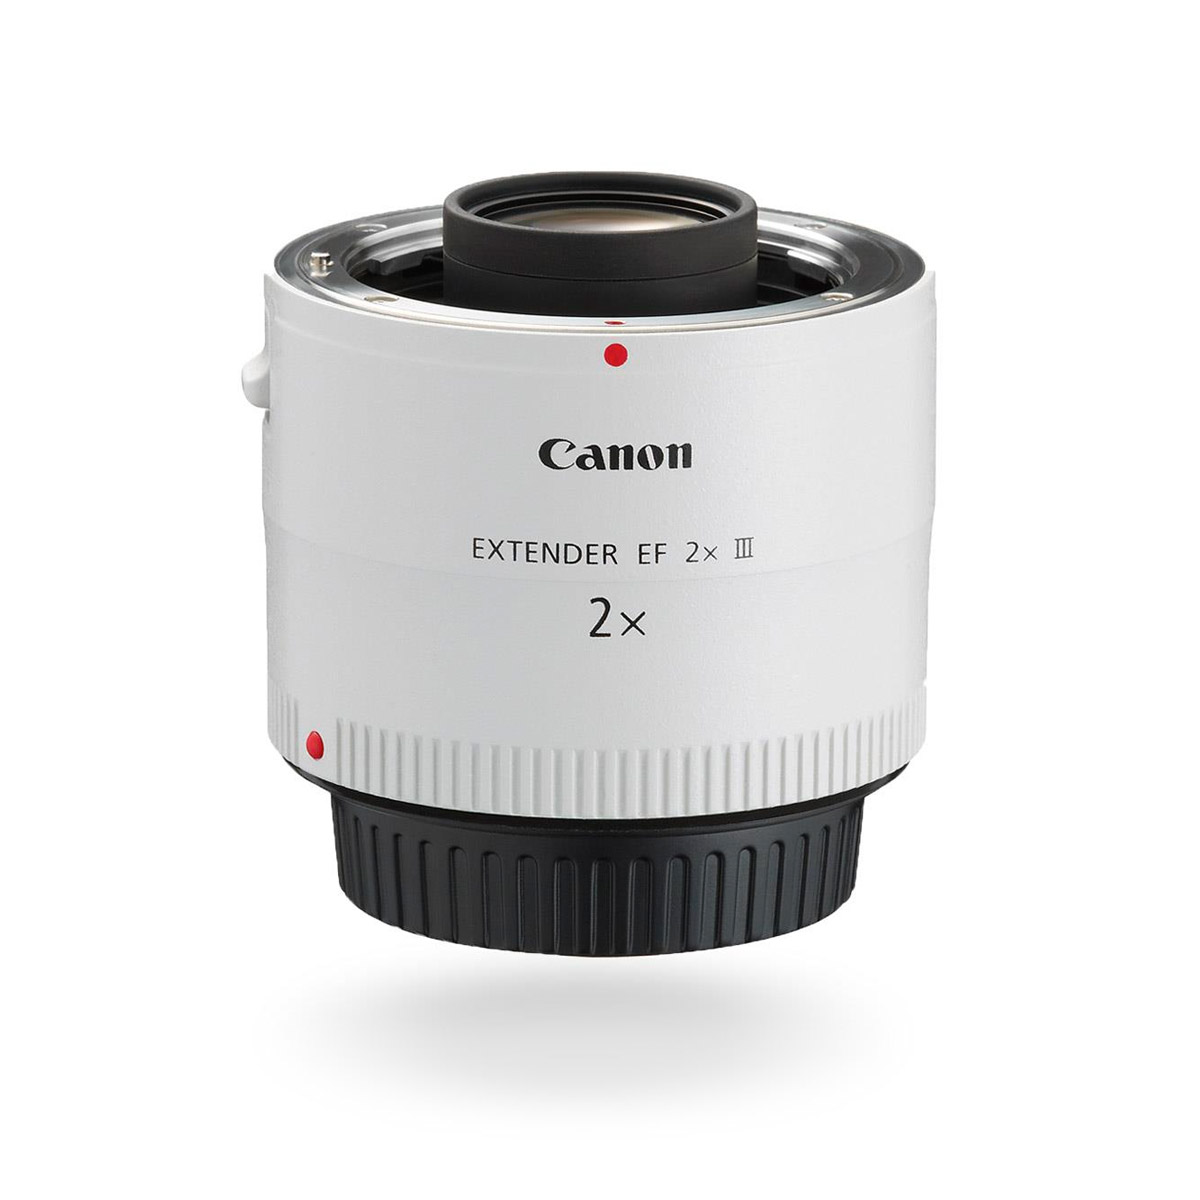 Lens extender 2 0x III